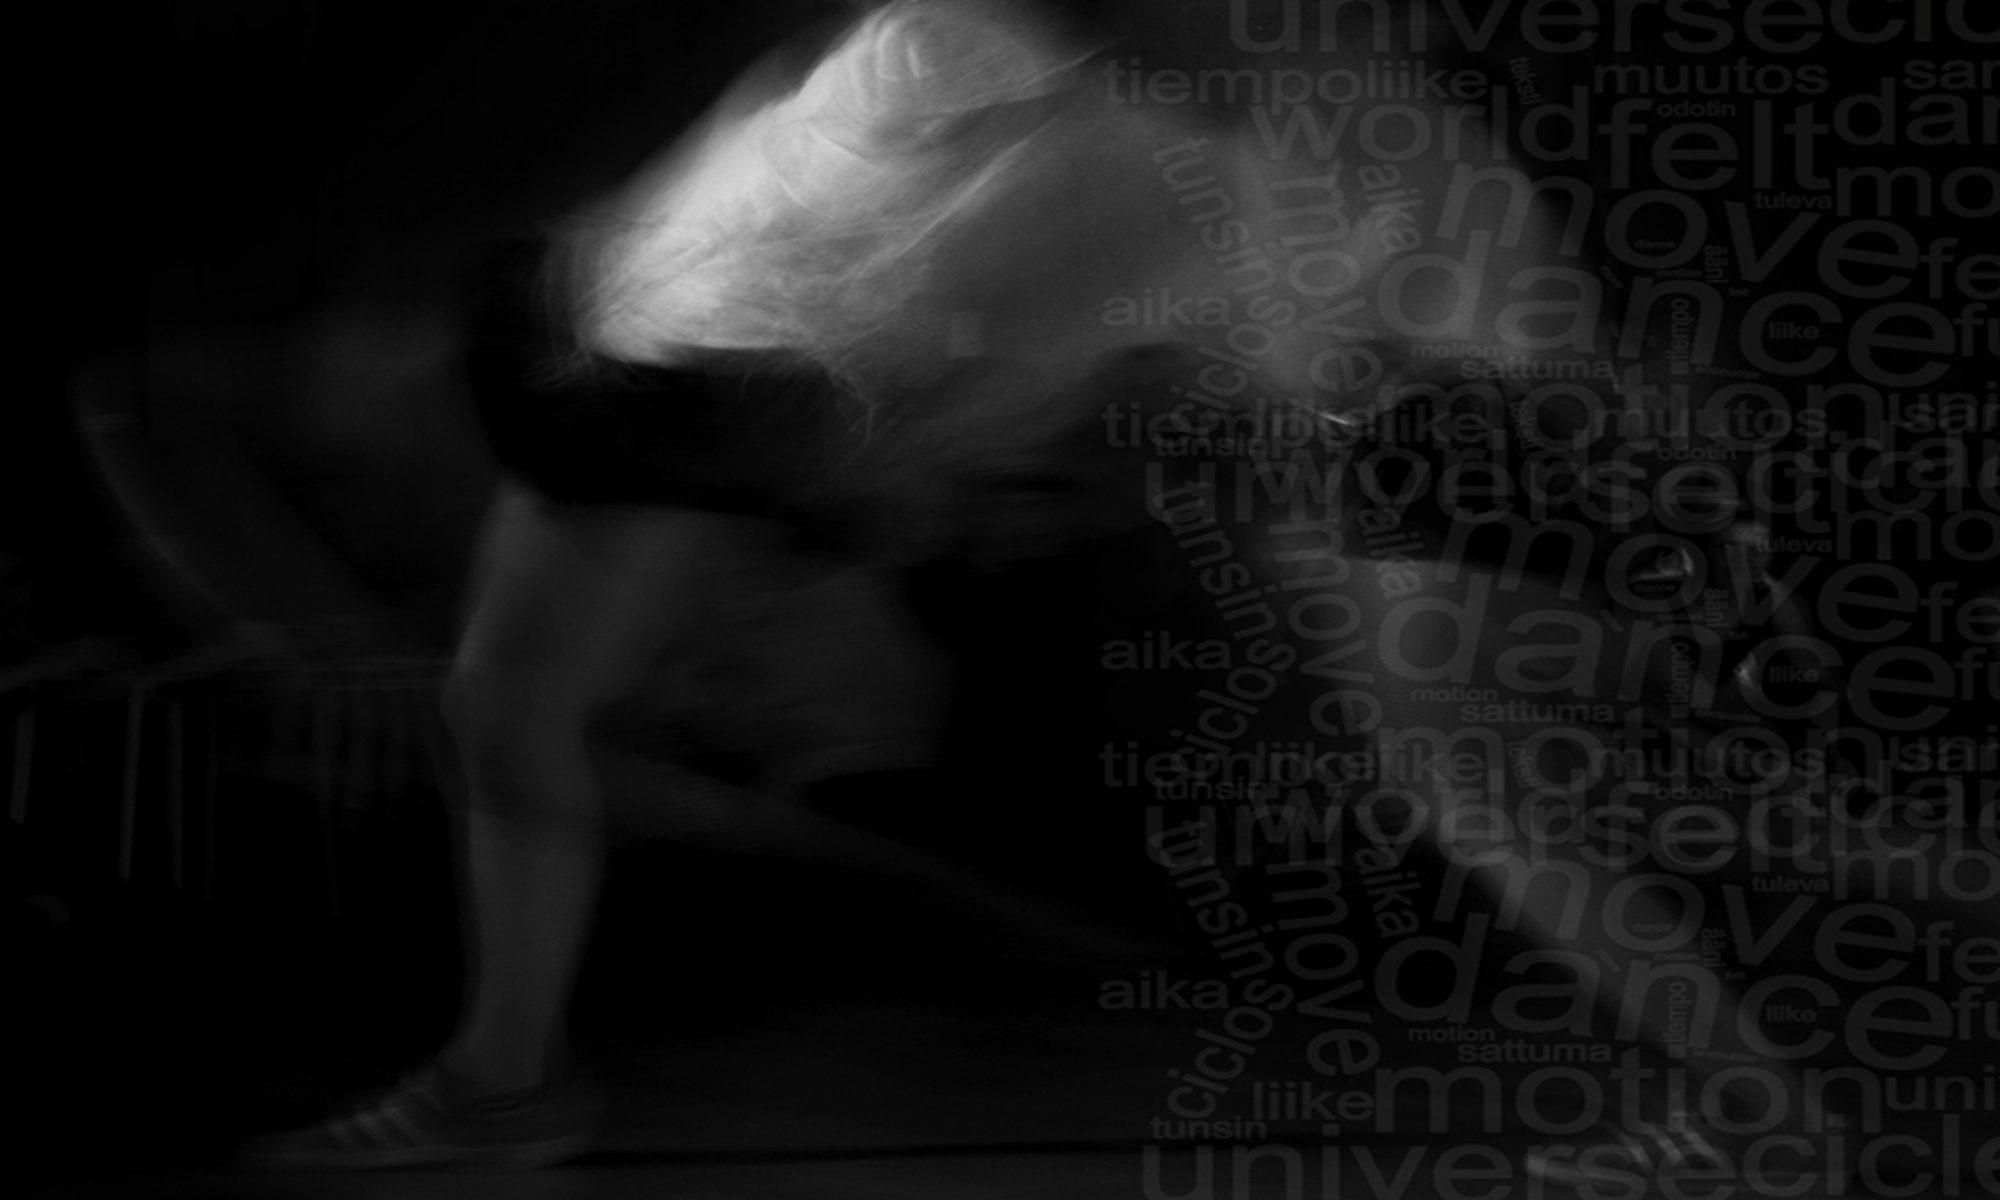 Textual Motion